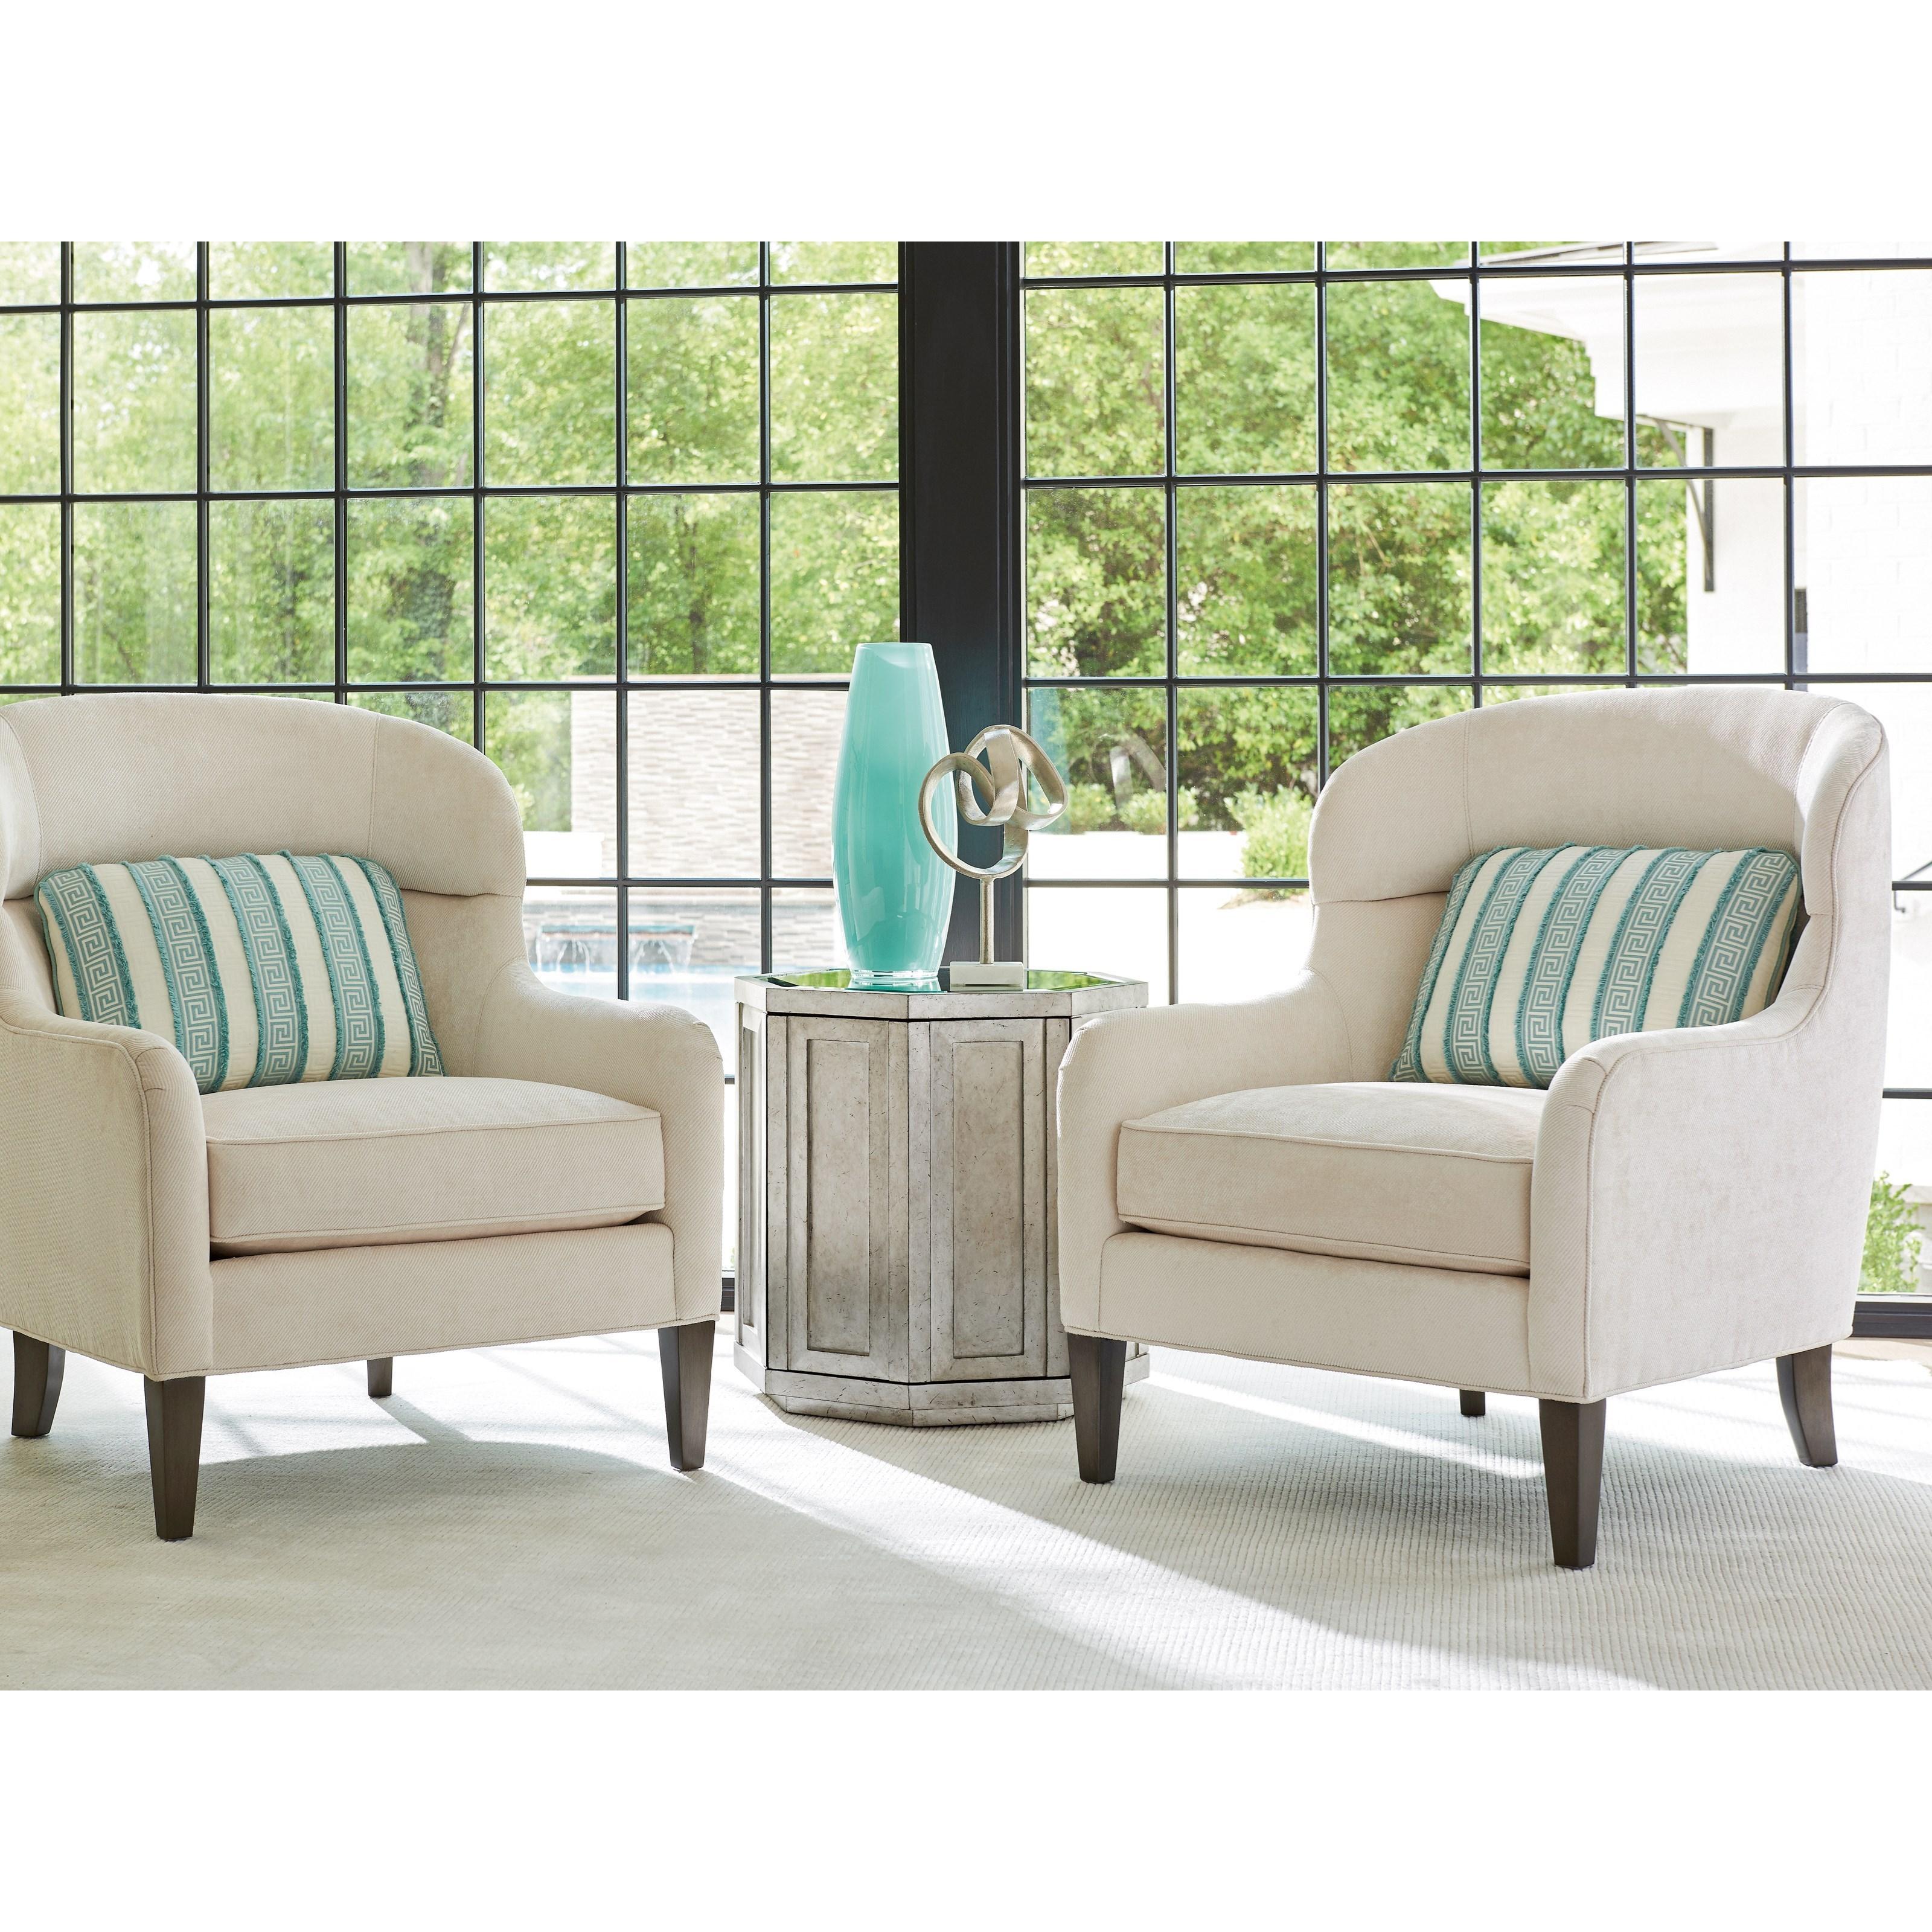 Lexington Ariana 7648 11 Chaffery Barrel Back Lounge Chair